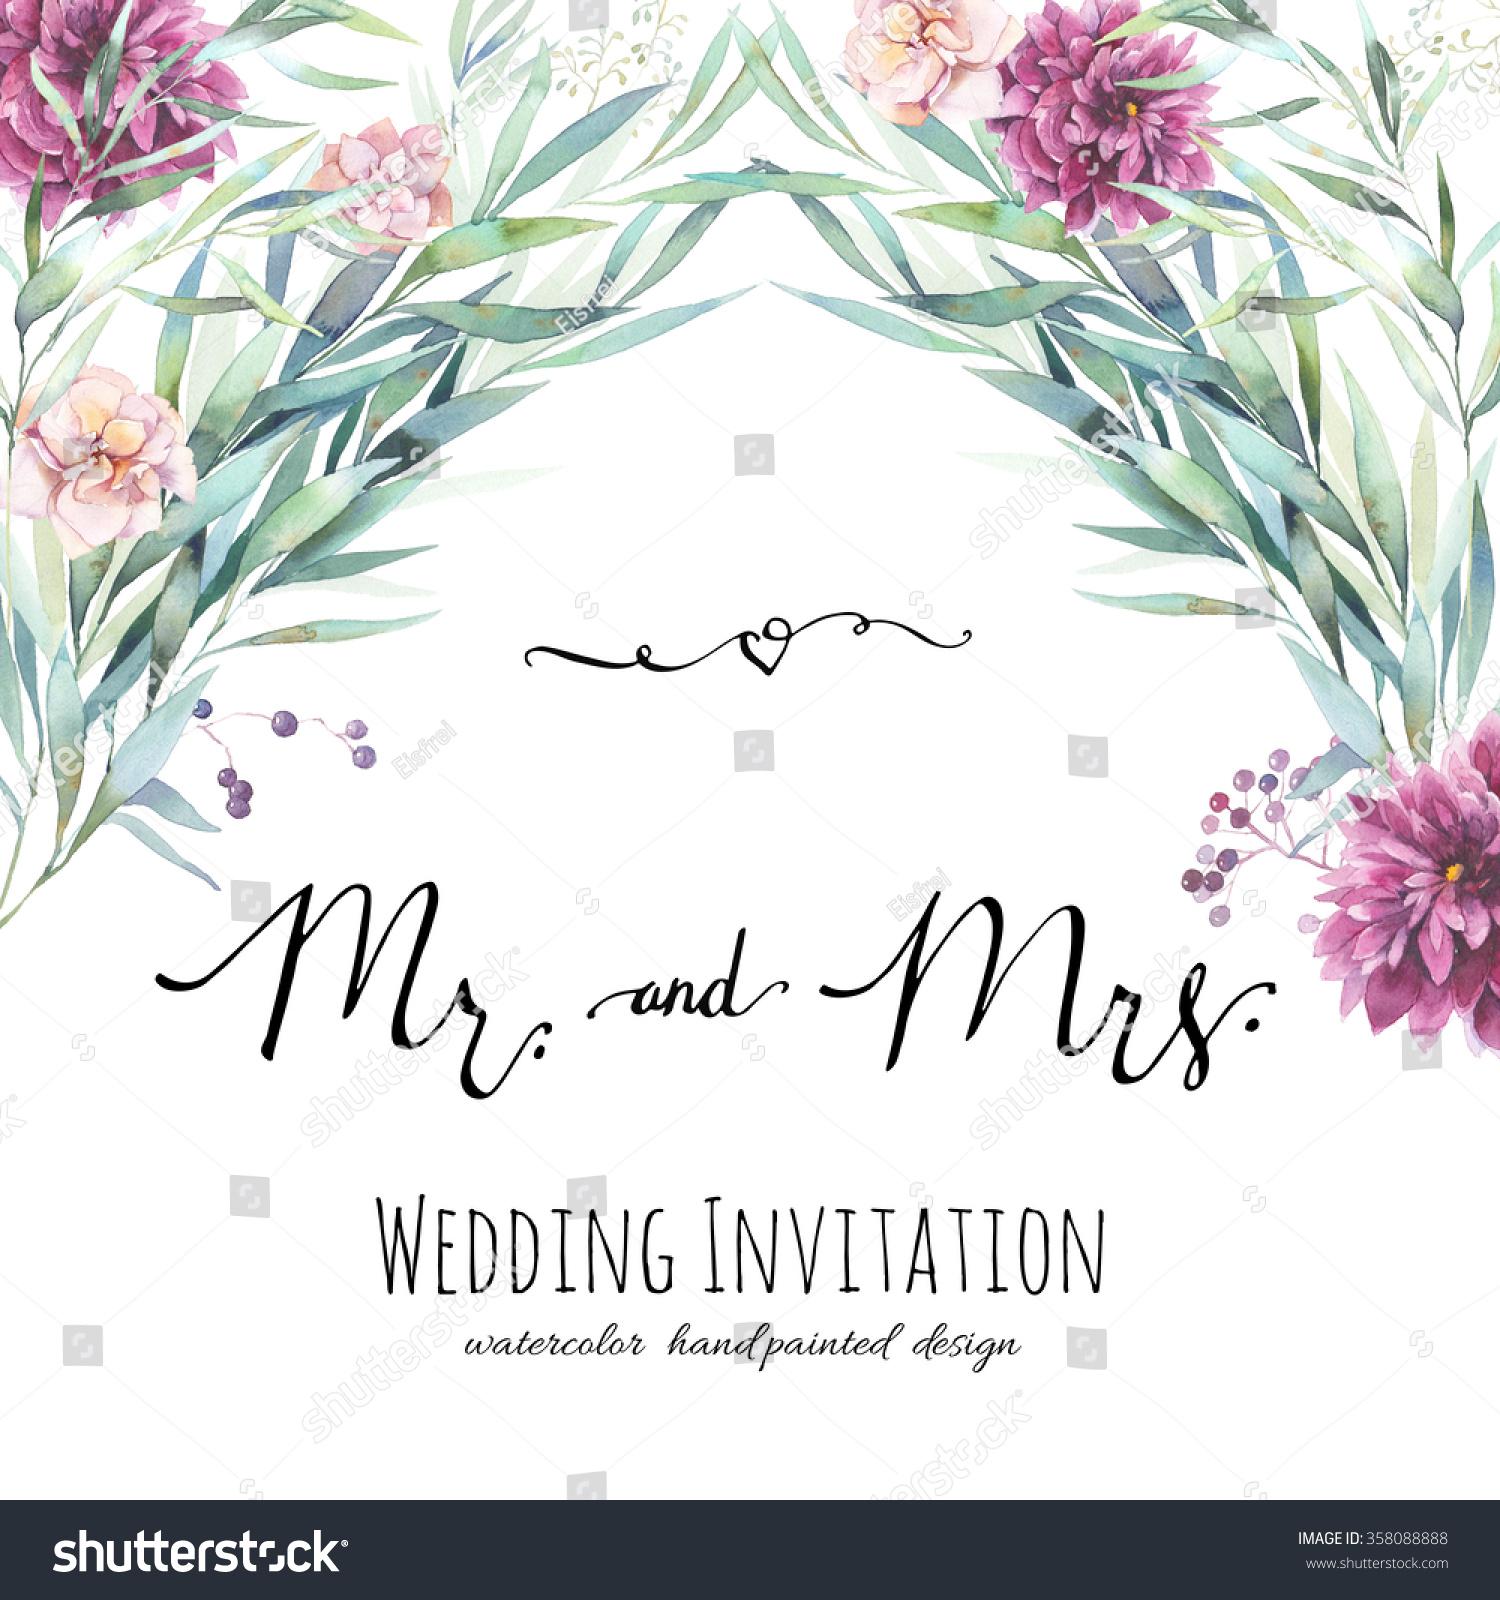 Watercolor wedding invitation modern calligraphy words